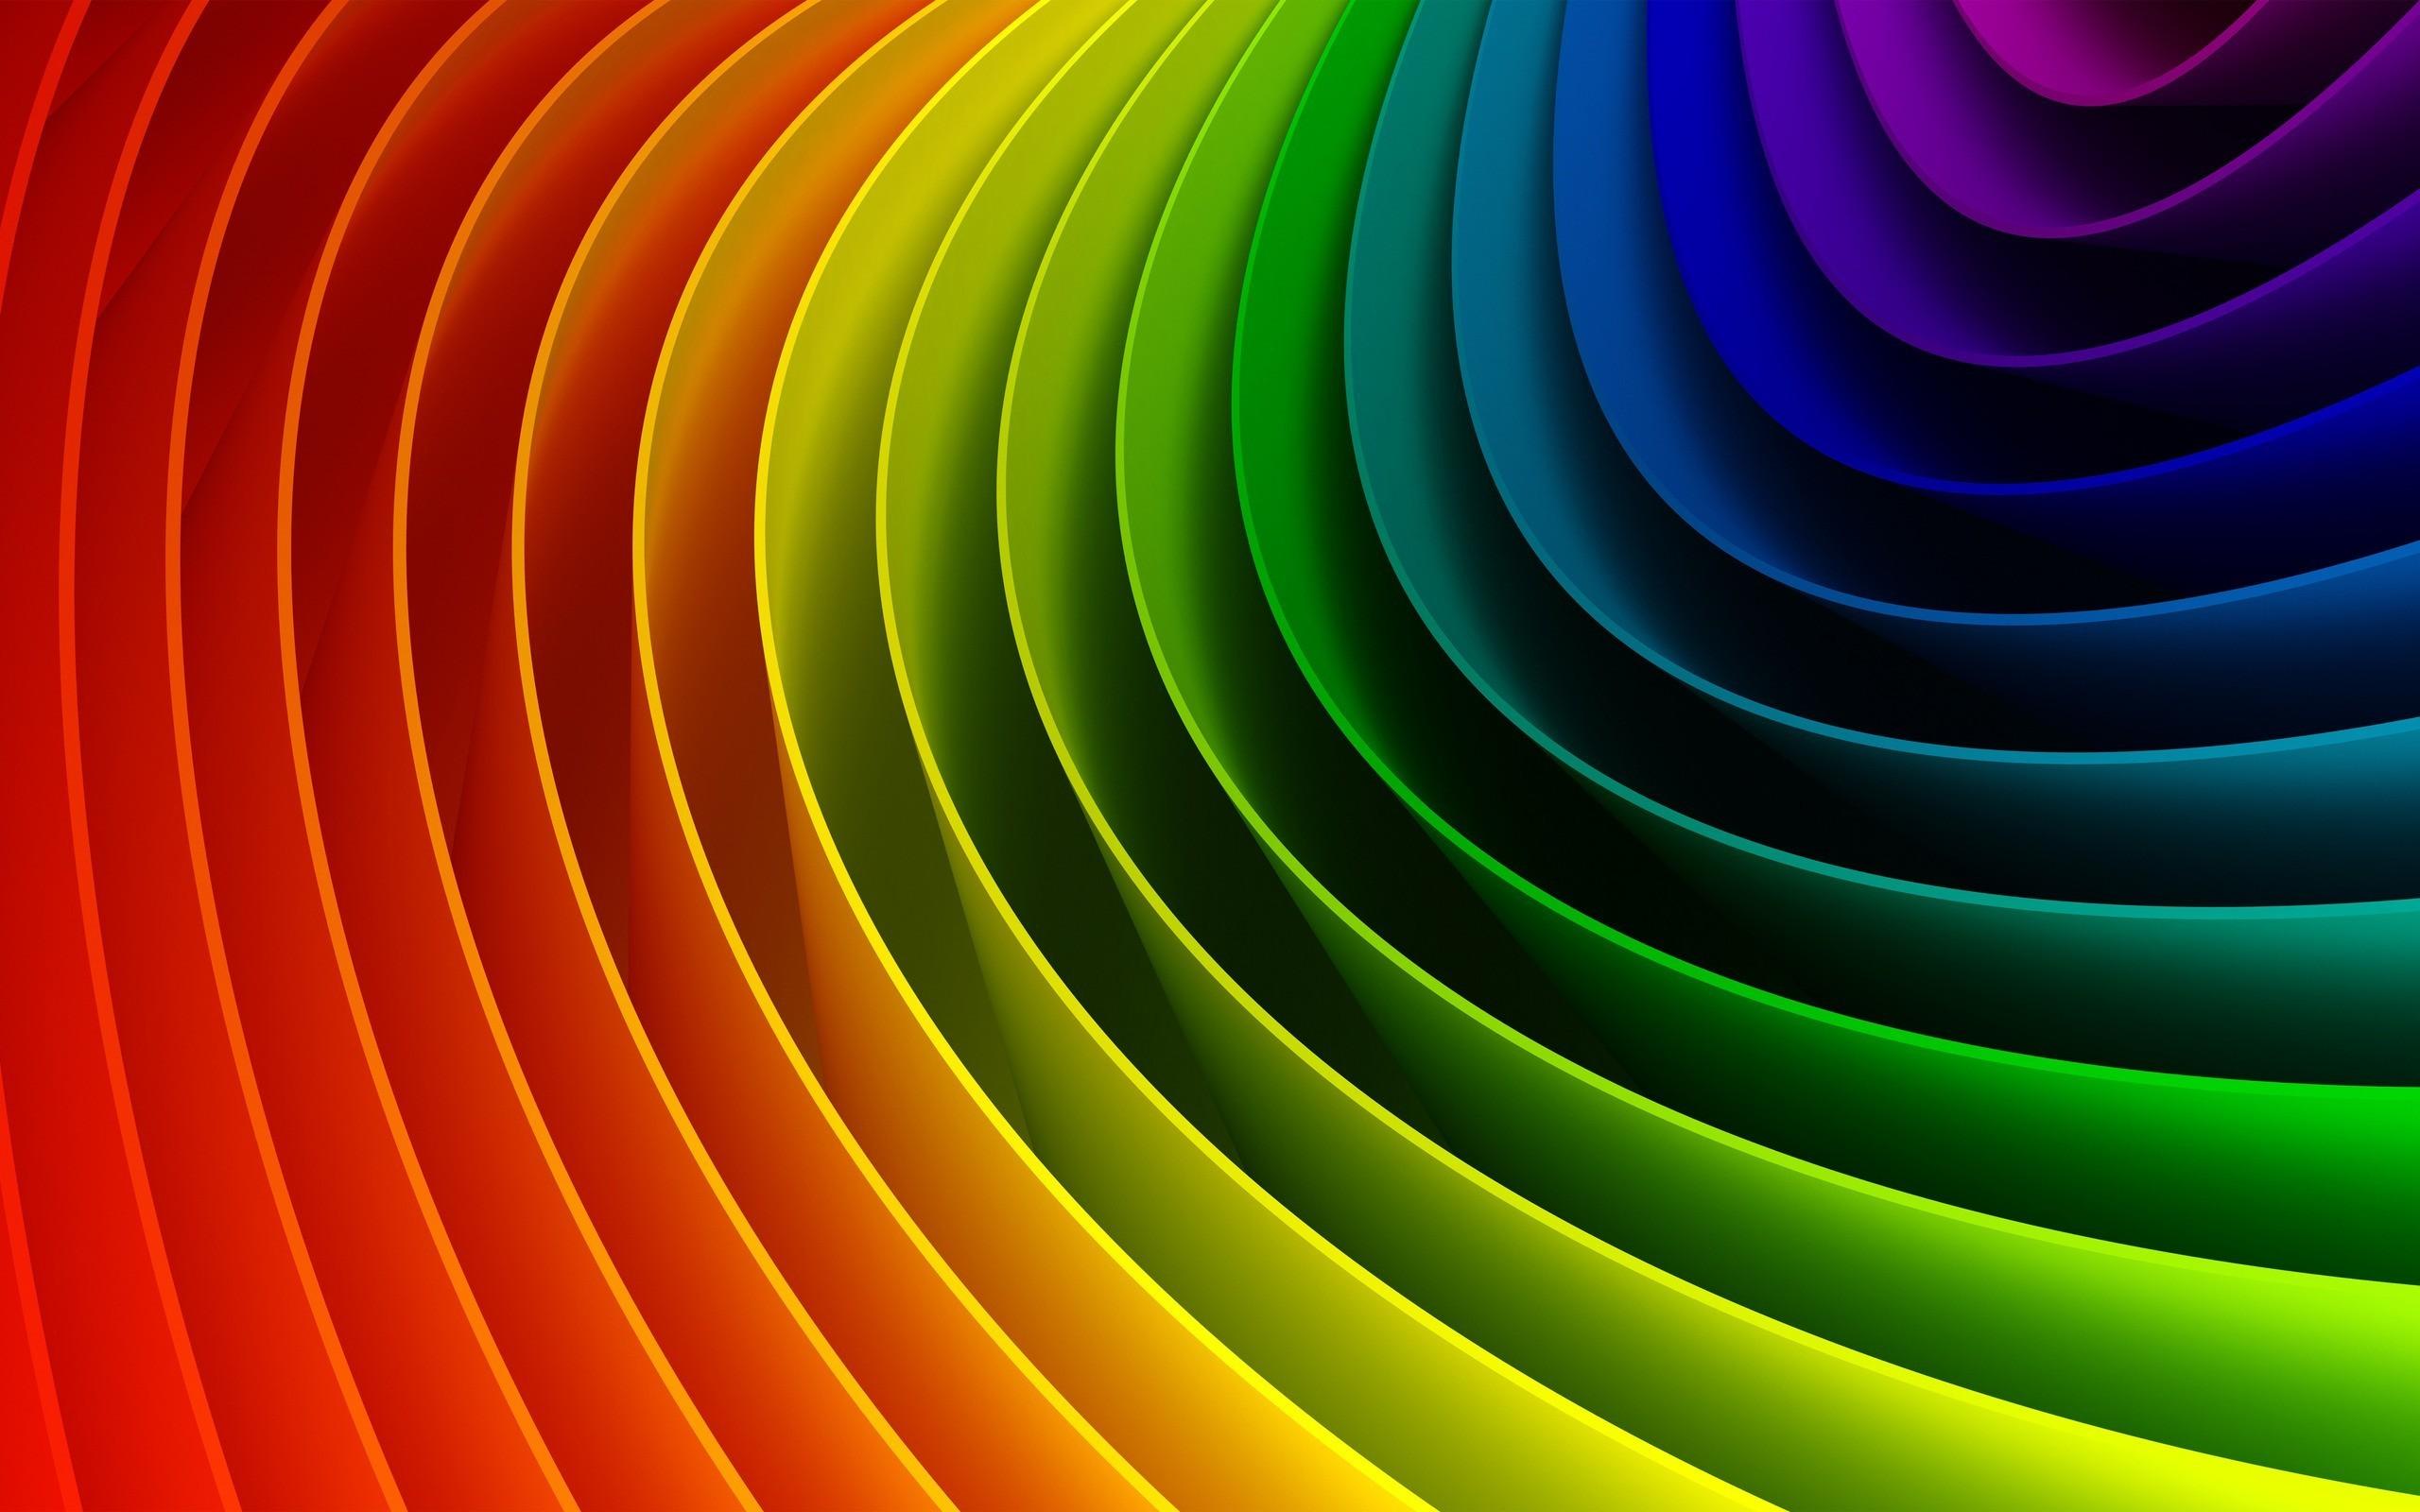 2560x1600, Download Wallpaper - Rainbow Backgrounds - HD Wallpaper